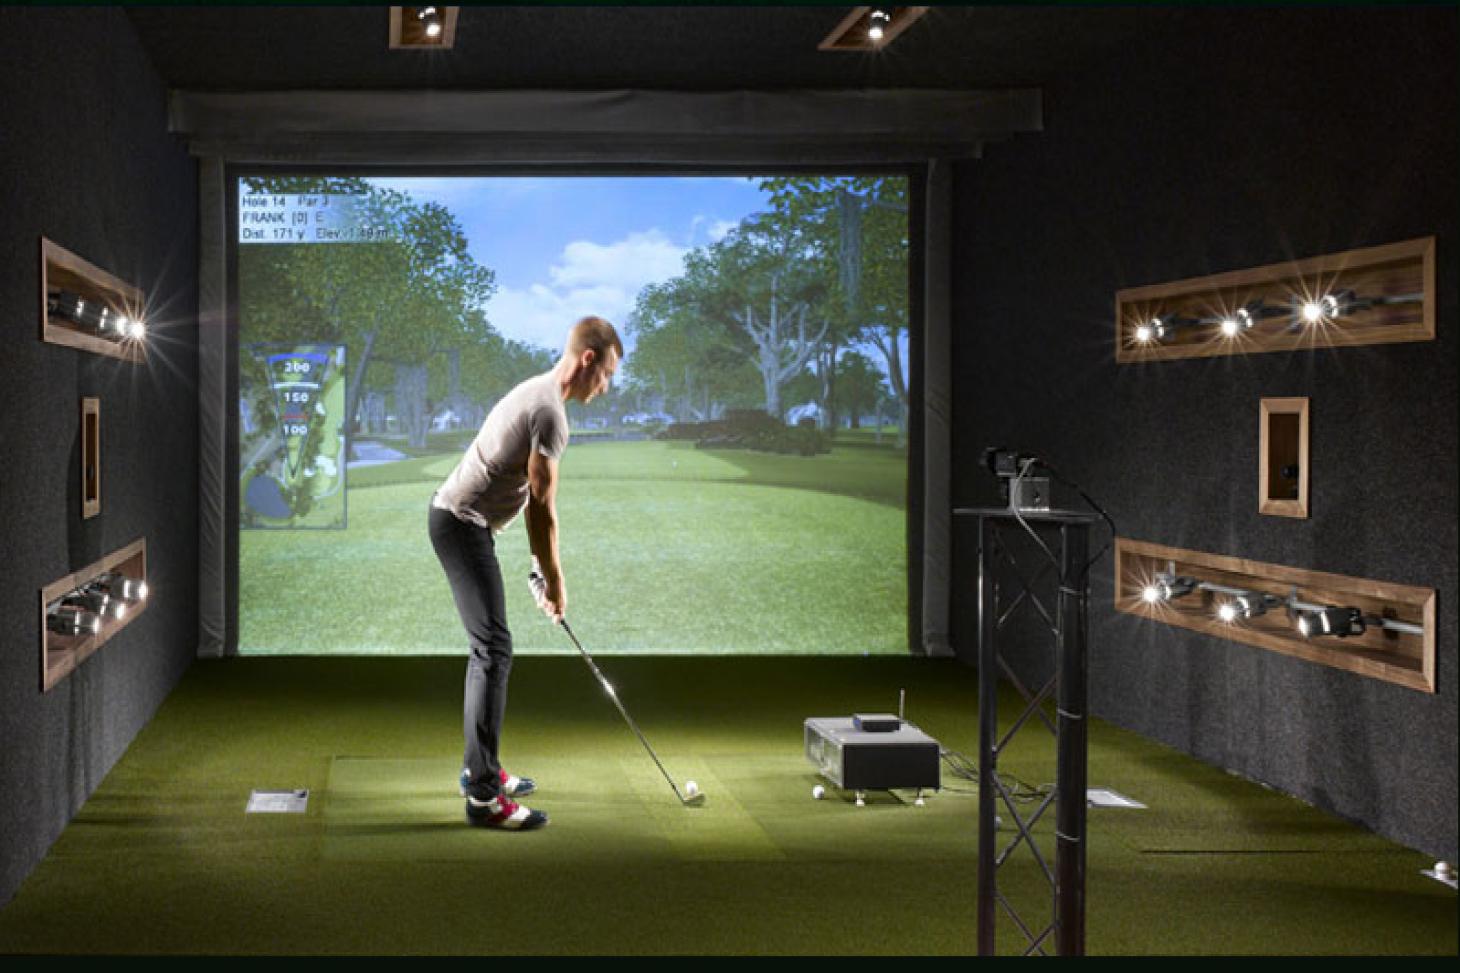 Urban Golf Soho 18 hole golf course